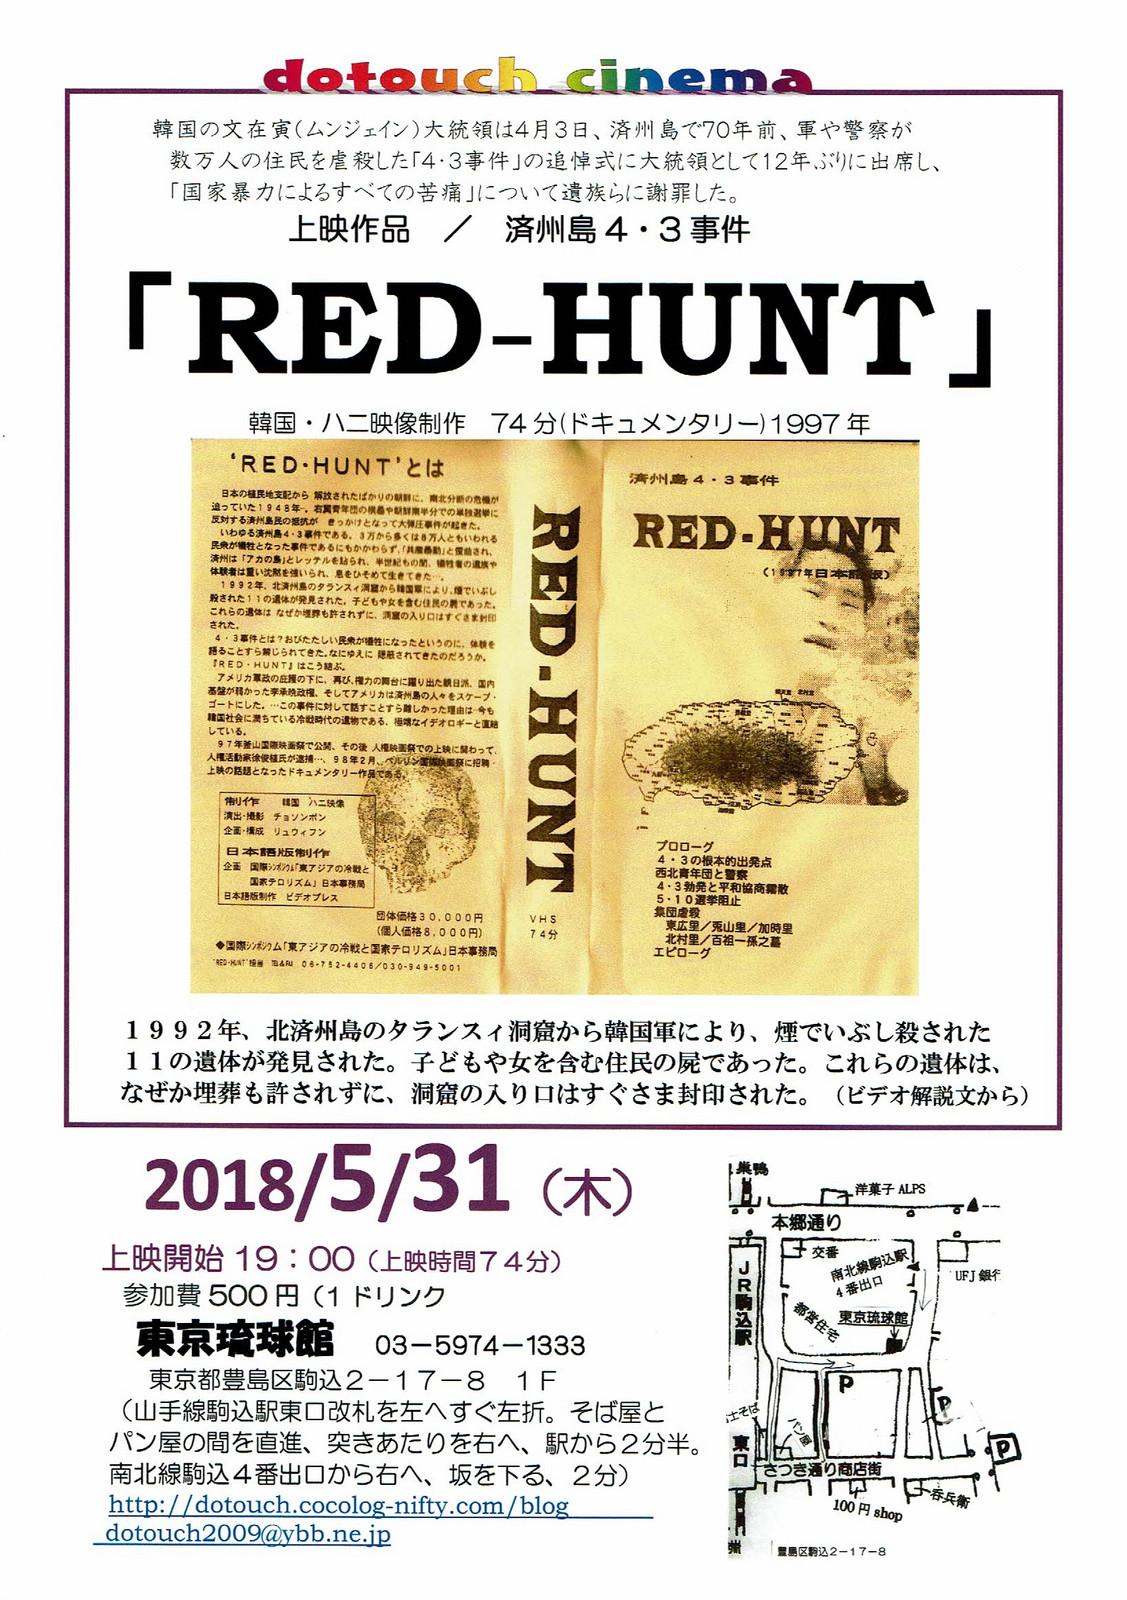 Redhunt